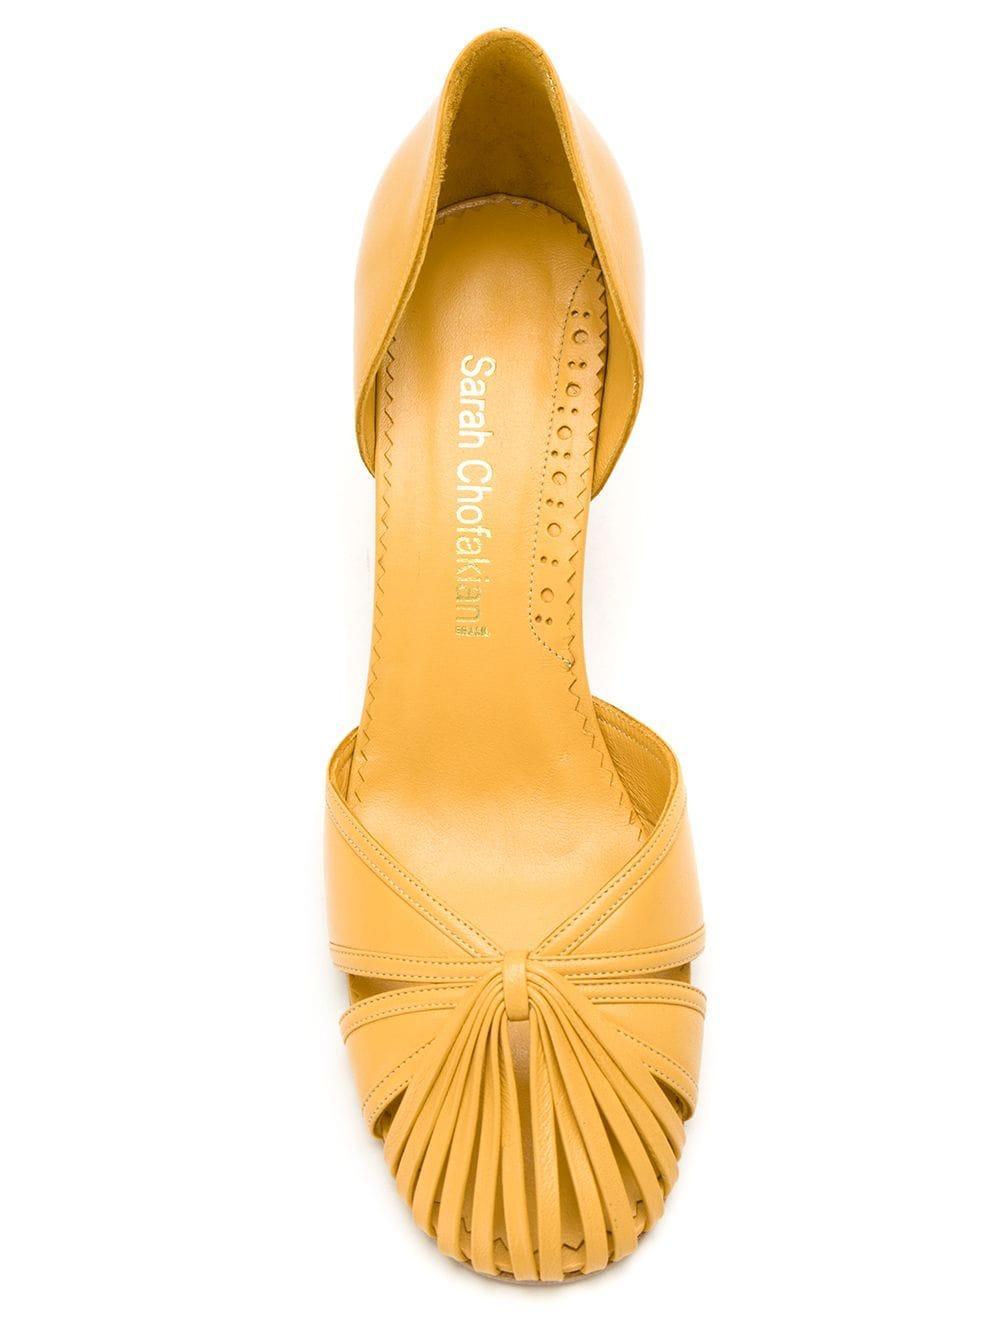 Zapatos de tacón Sarah Sarah Chofakian de Cuero de color Blanco